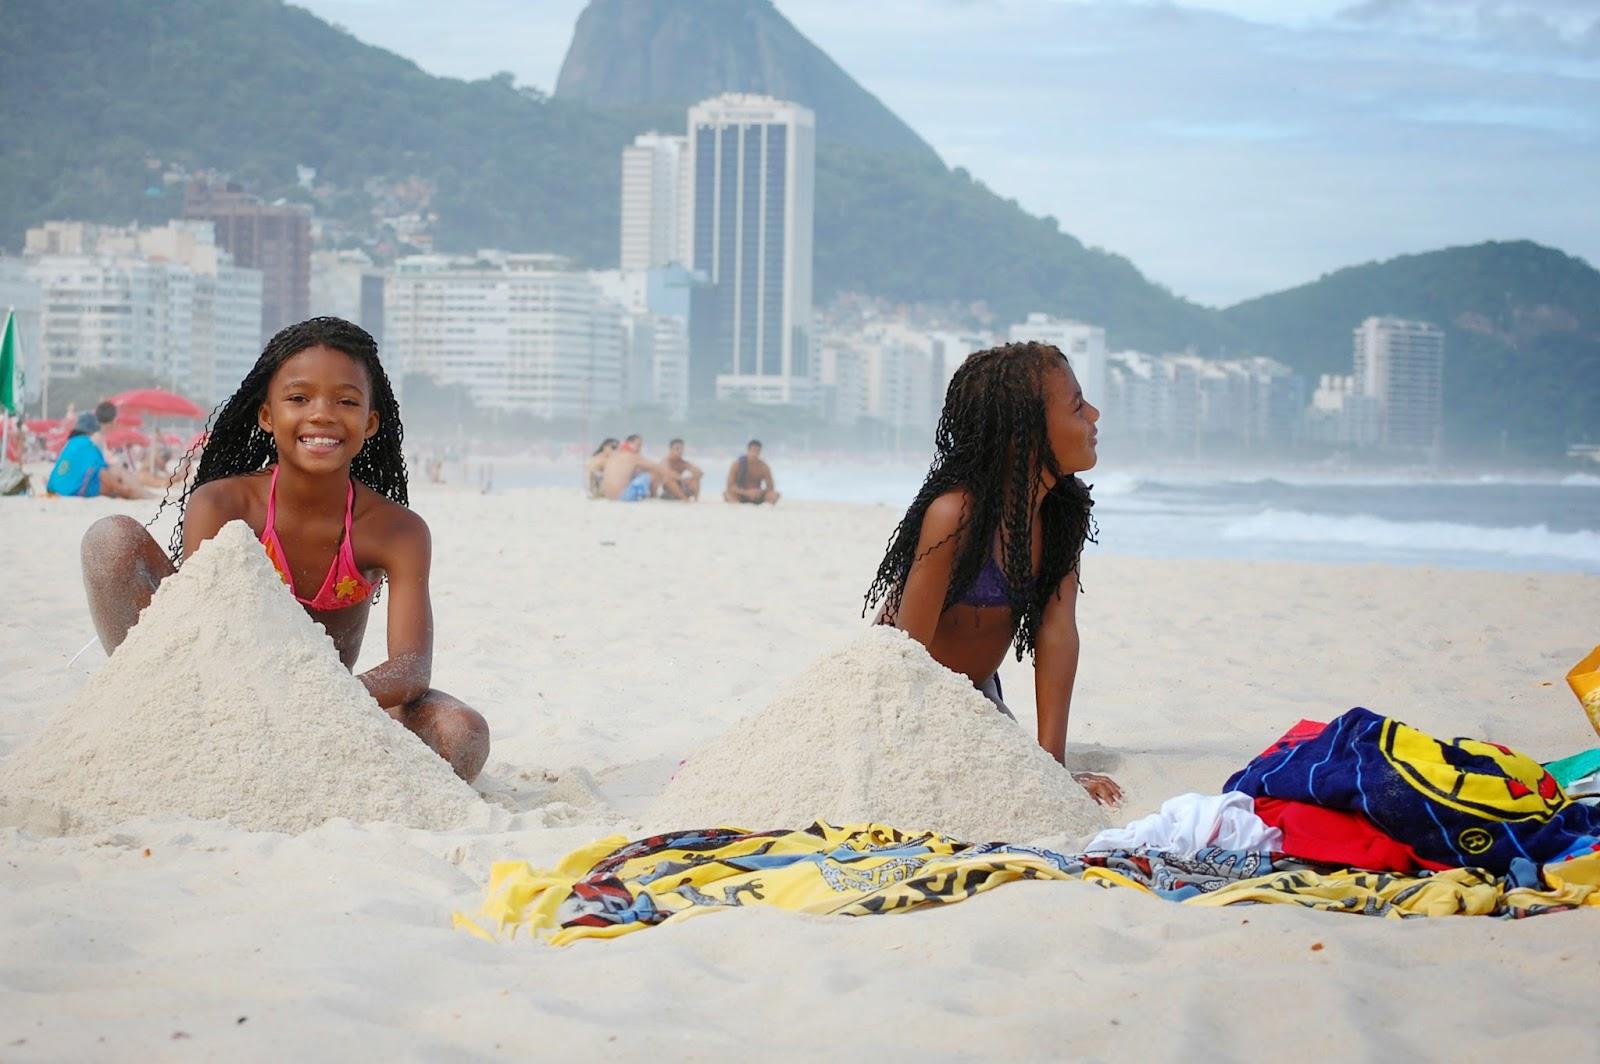 Copacabana; Rio de Janeiro, Brazil